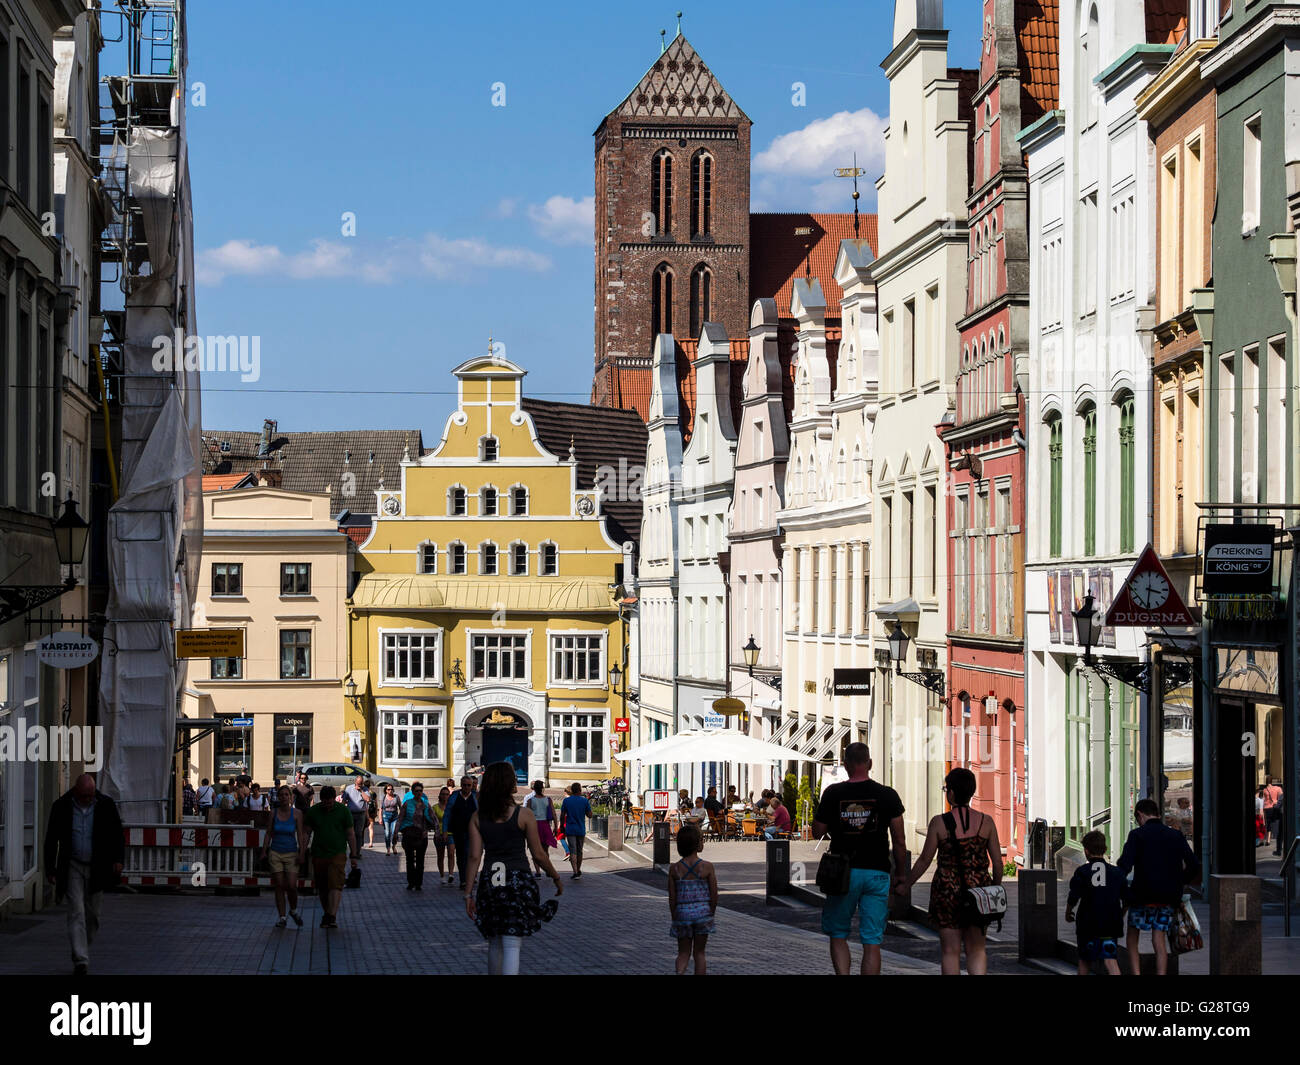 St. Nikolai church and facades in street Krämerstrasse, Wismar, Germany - Stock Image